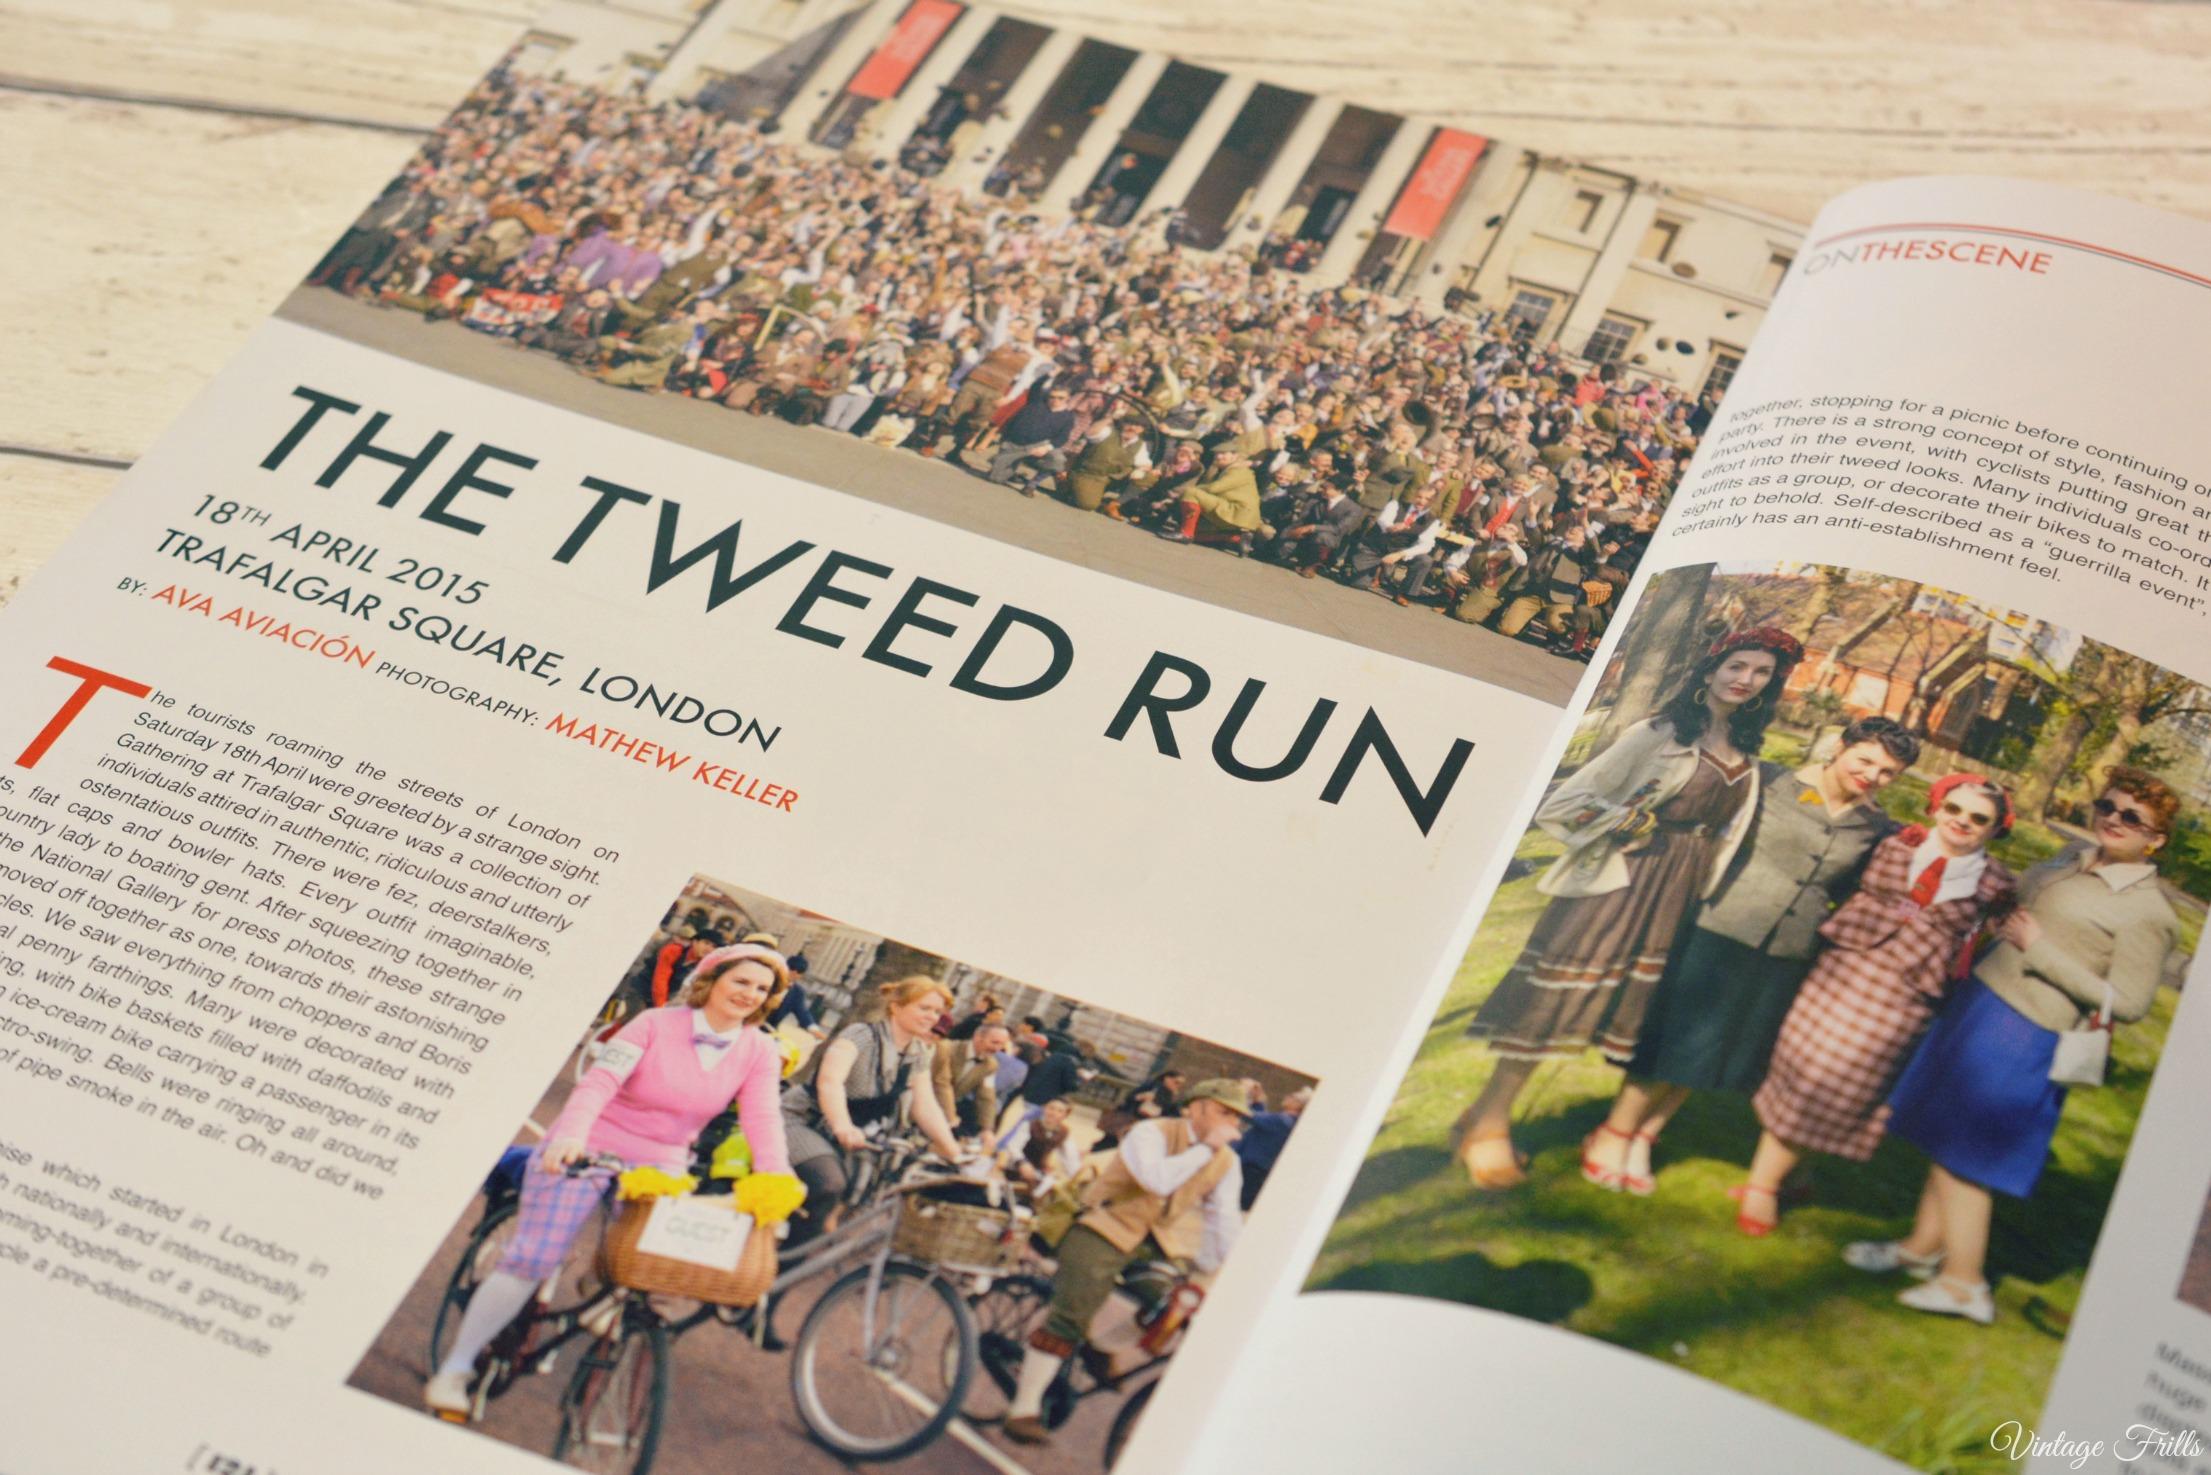 In retrospect the Tweed Run